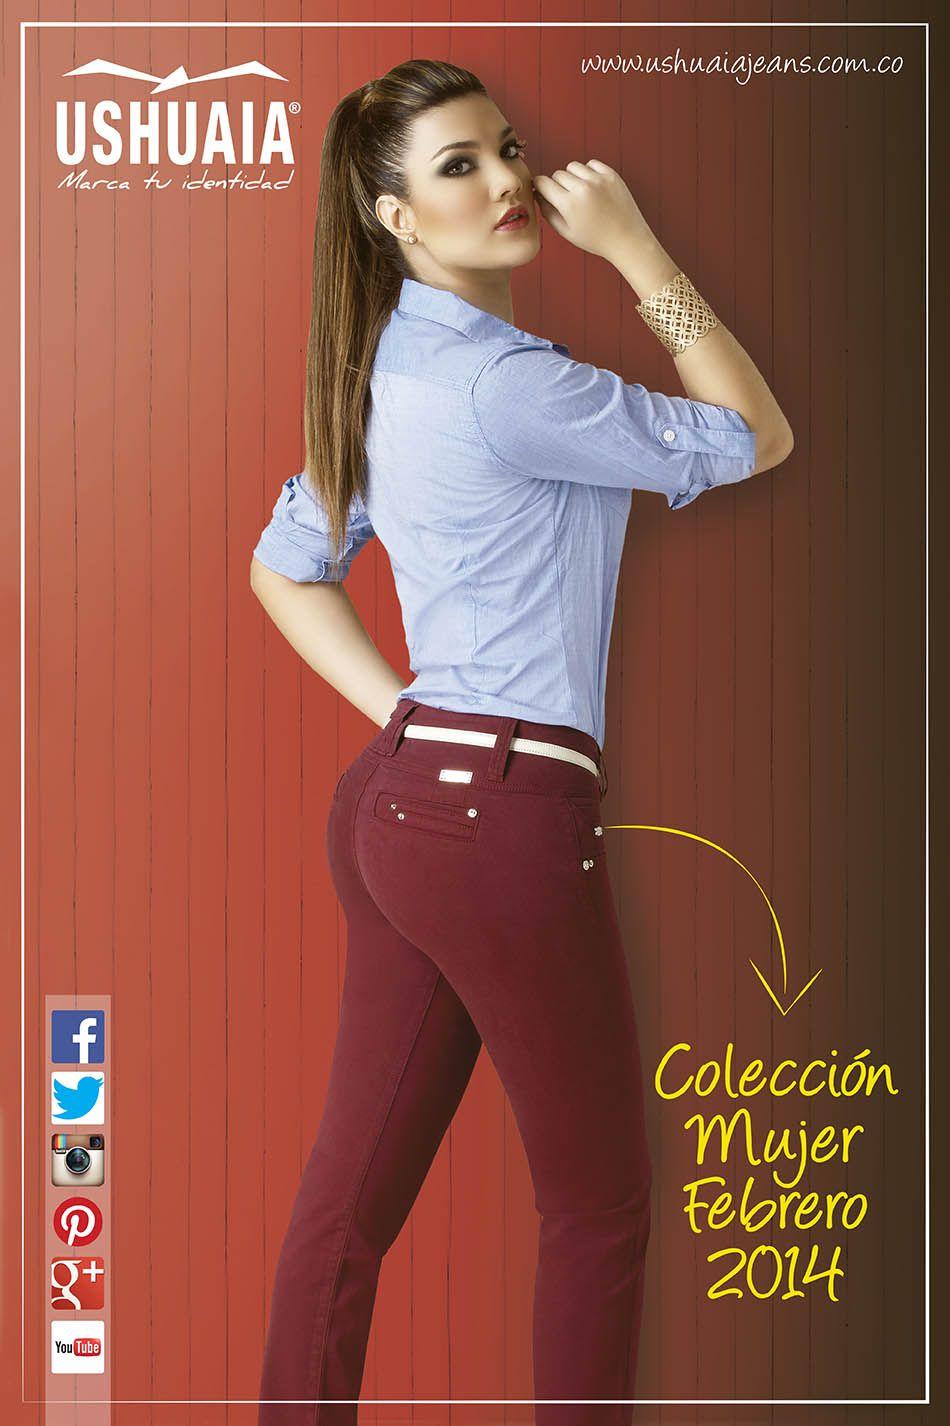 Portada Catalogo Ropa De Moda Mujer Coleccion Febrero 2014 Moda Para Mujer Catalogos De Ropa Ropa